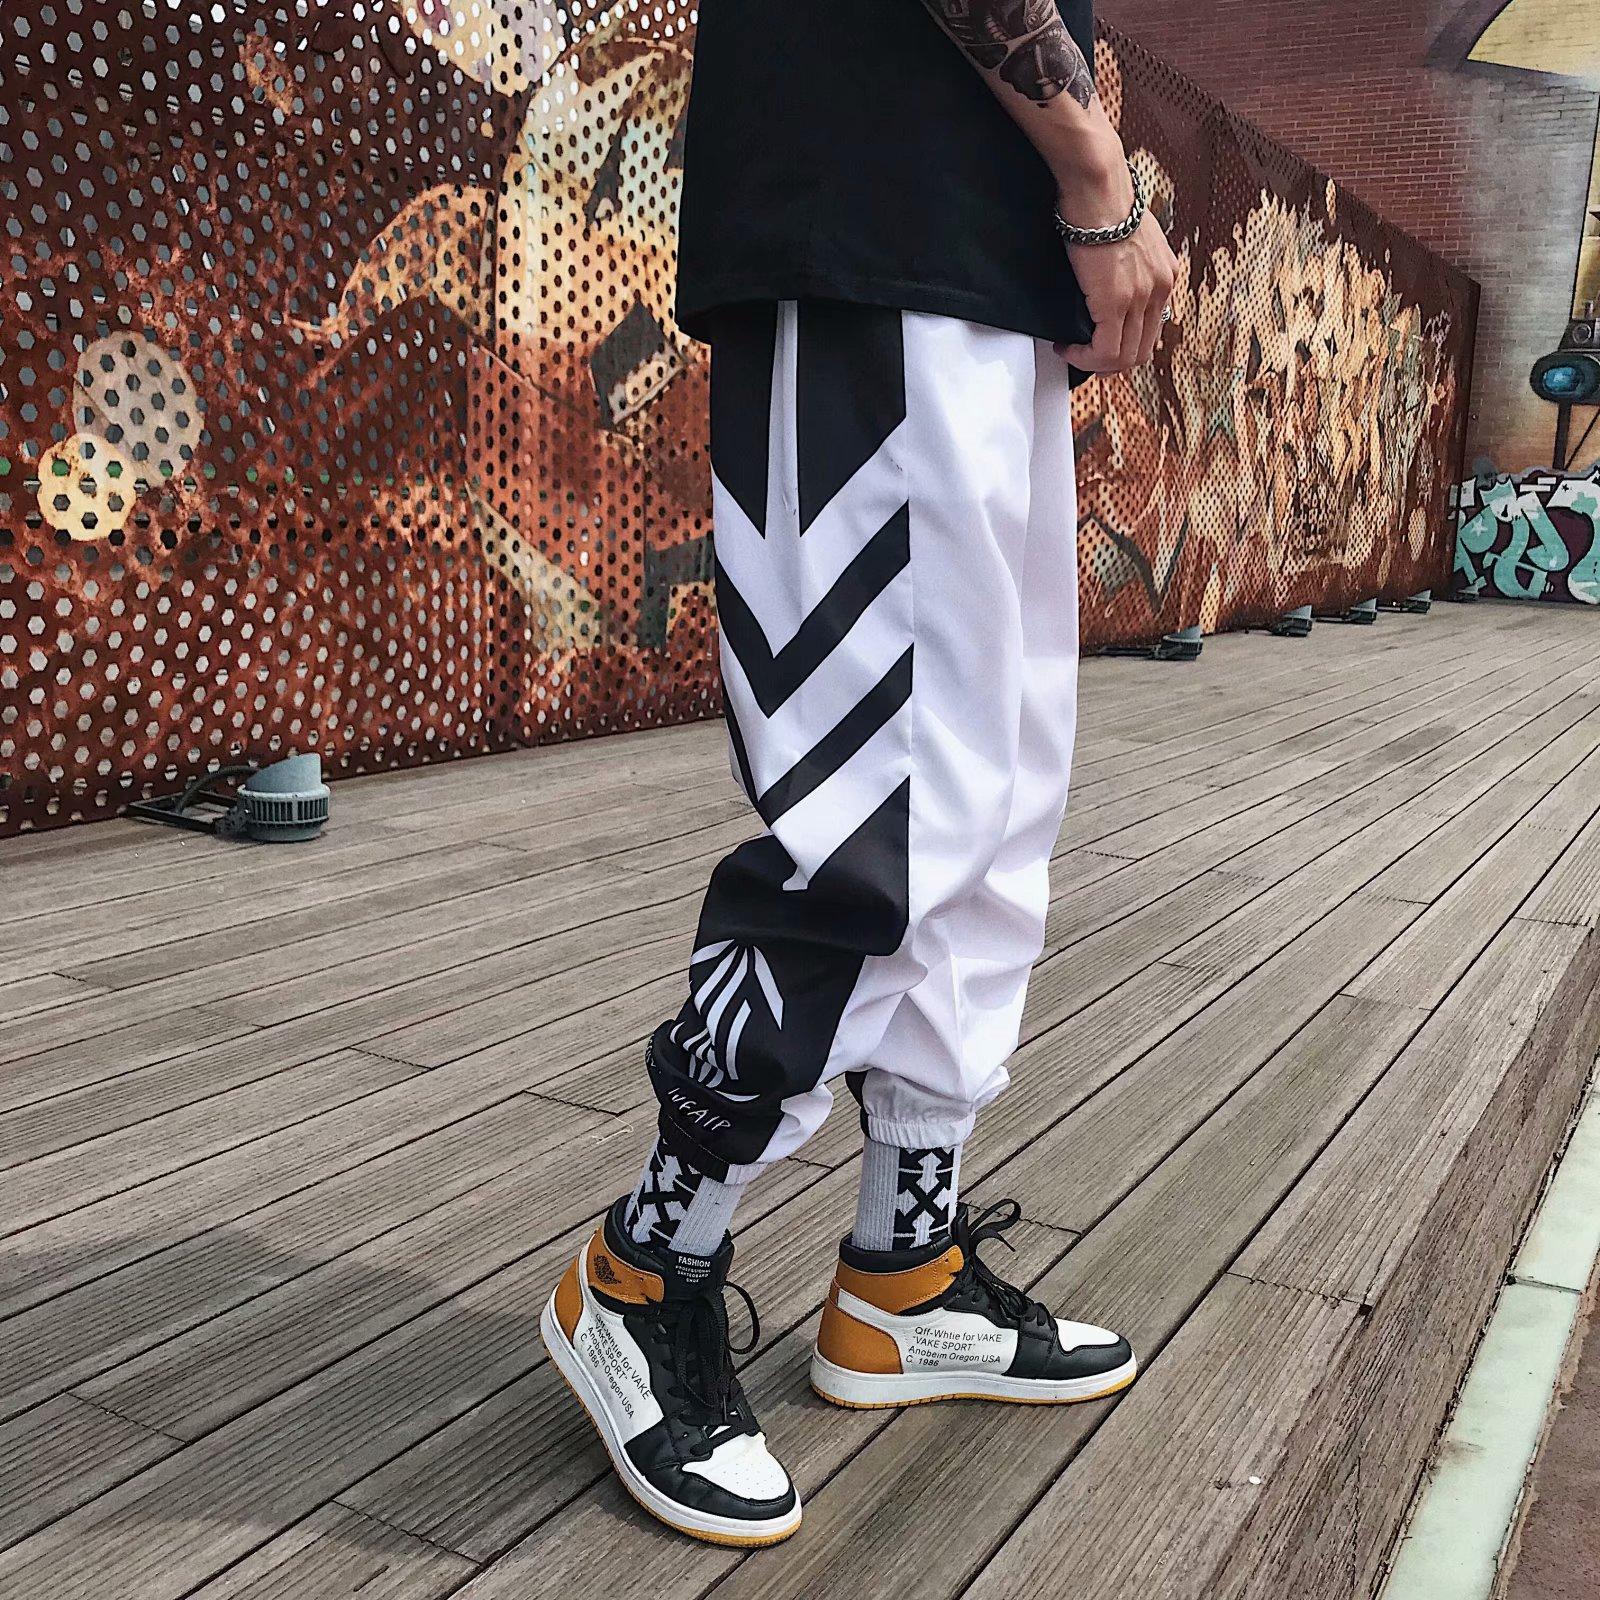 Loldeal Sweatpants Men Plus Size Casual Black White Stripe Printed Fashion Men Pants Hip Hop Pants Harem Pants Trousers